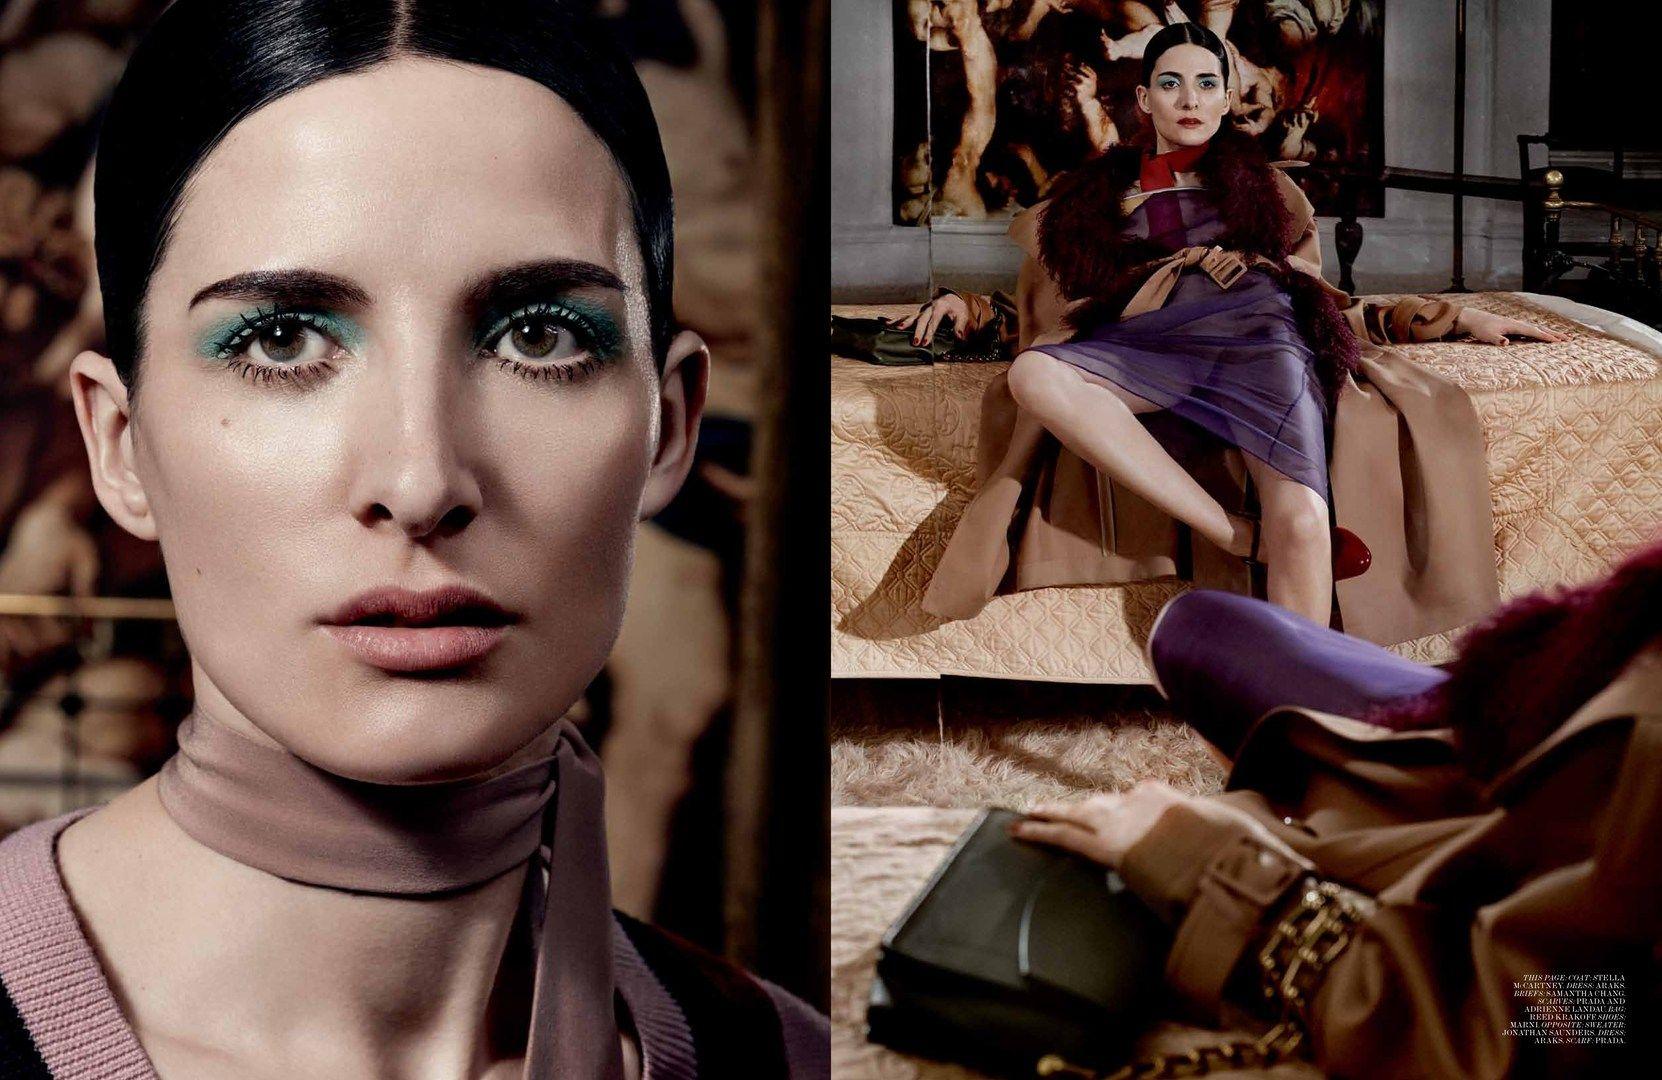 Interview May 2014 Ph Craig McDean St Karl Templer models Kim Peers & Querelle Jansen lookbooks